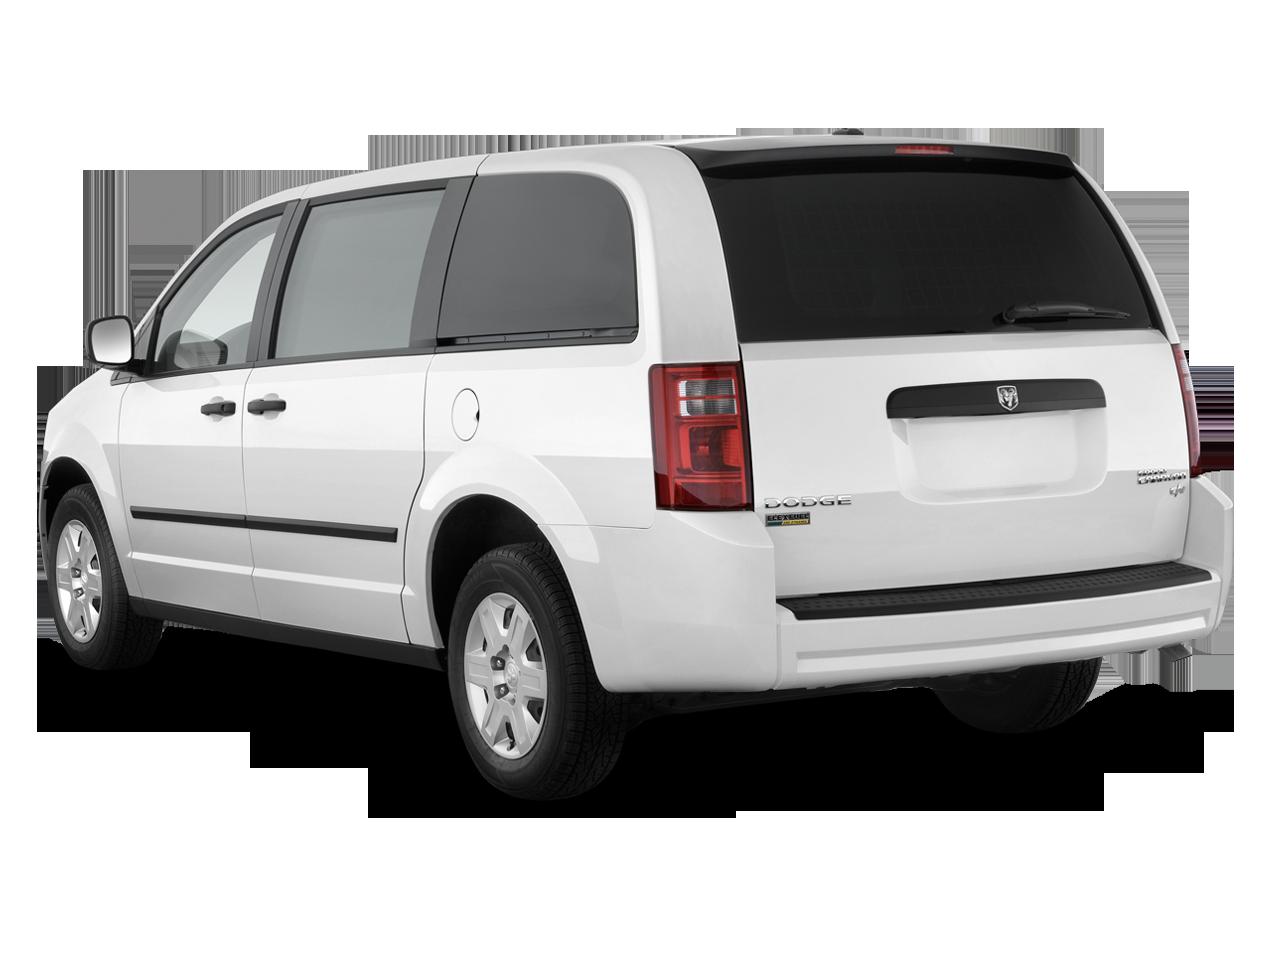 2009 Dodge Grand Caravan Sxt 3 8 Dodge Minivan Review